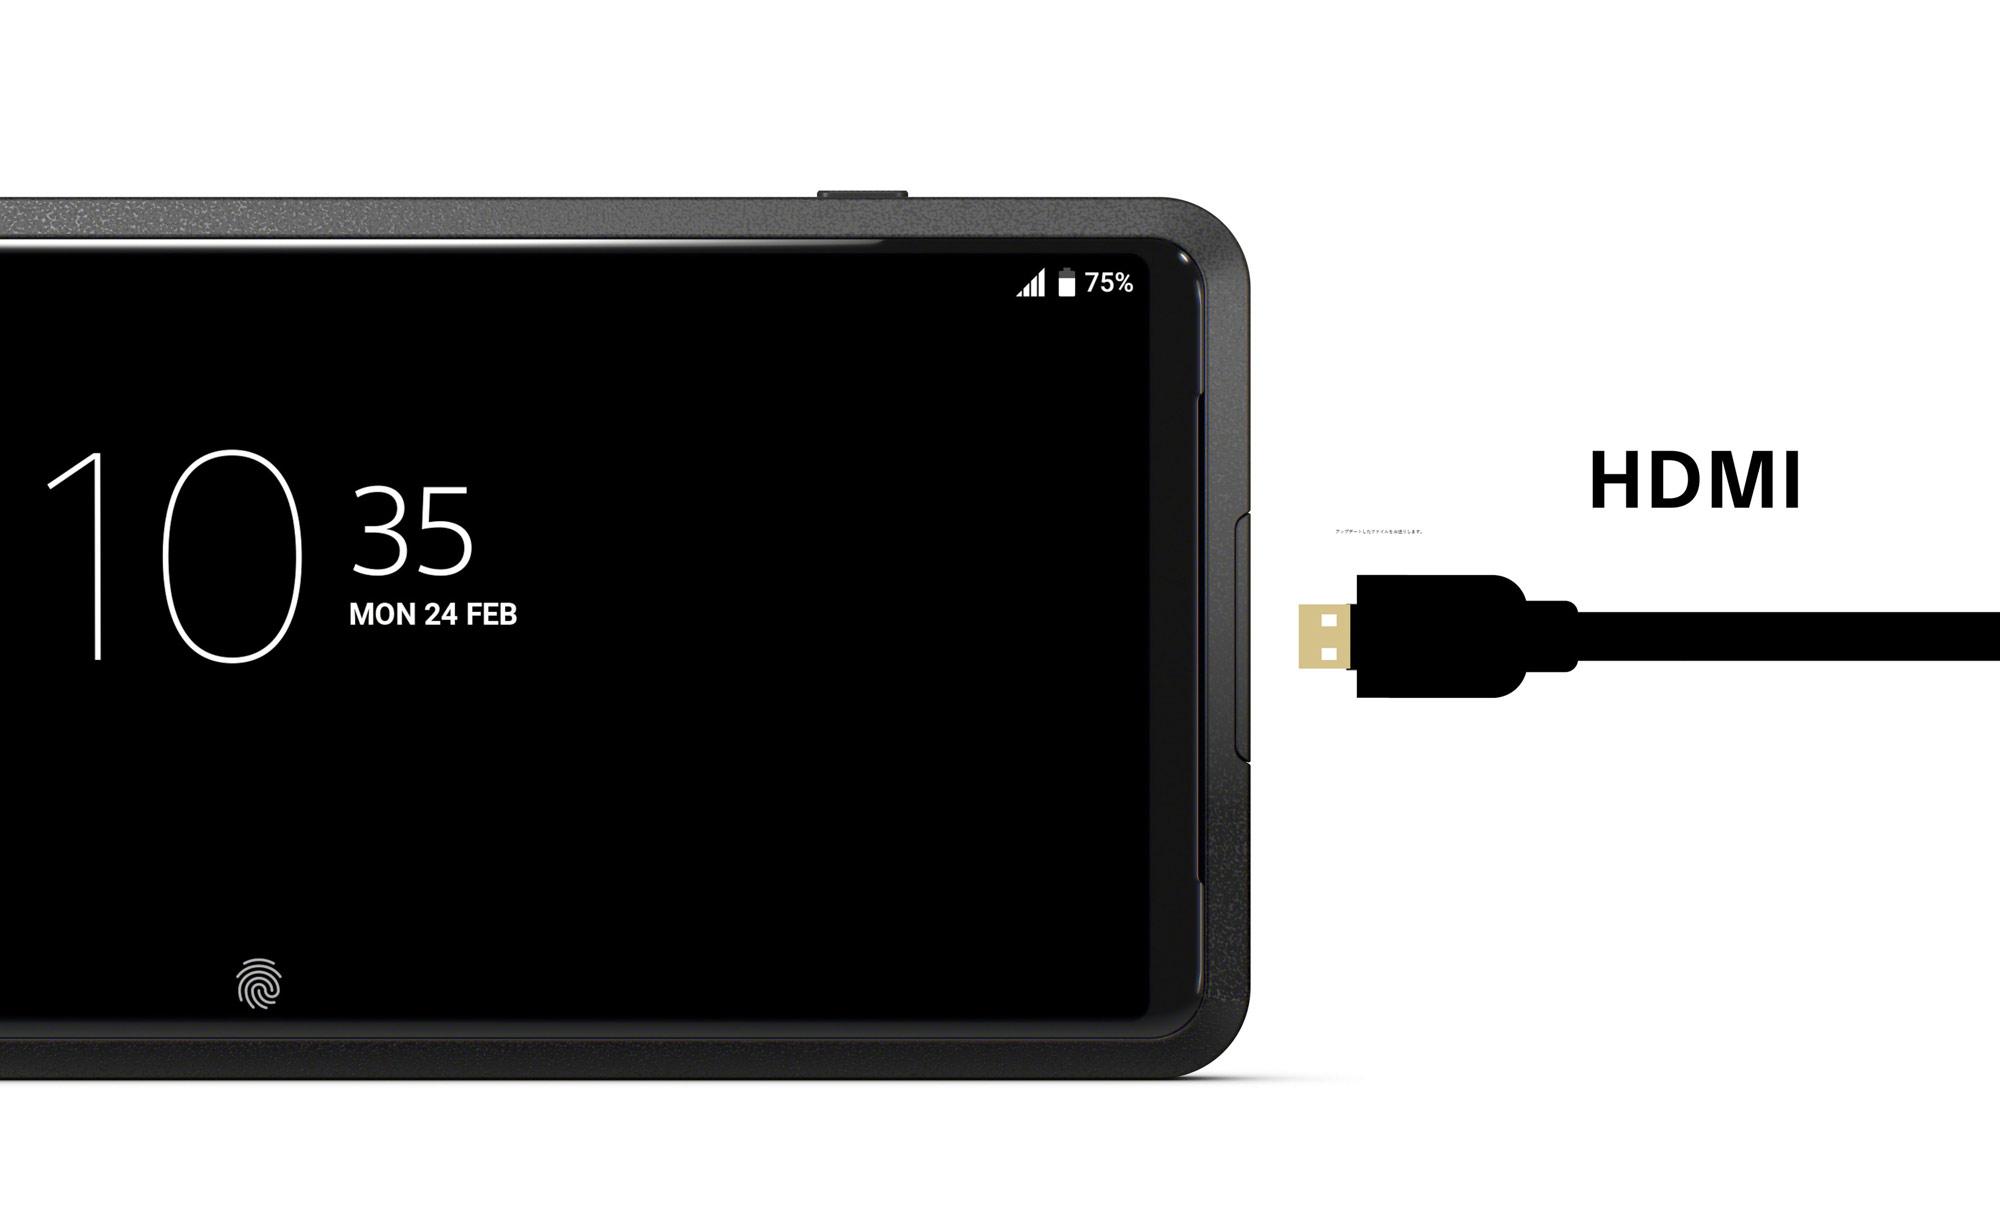 Sony Xperia Pro HDMI Anschluss